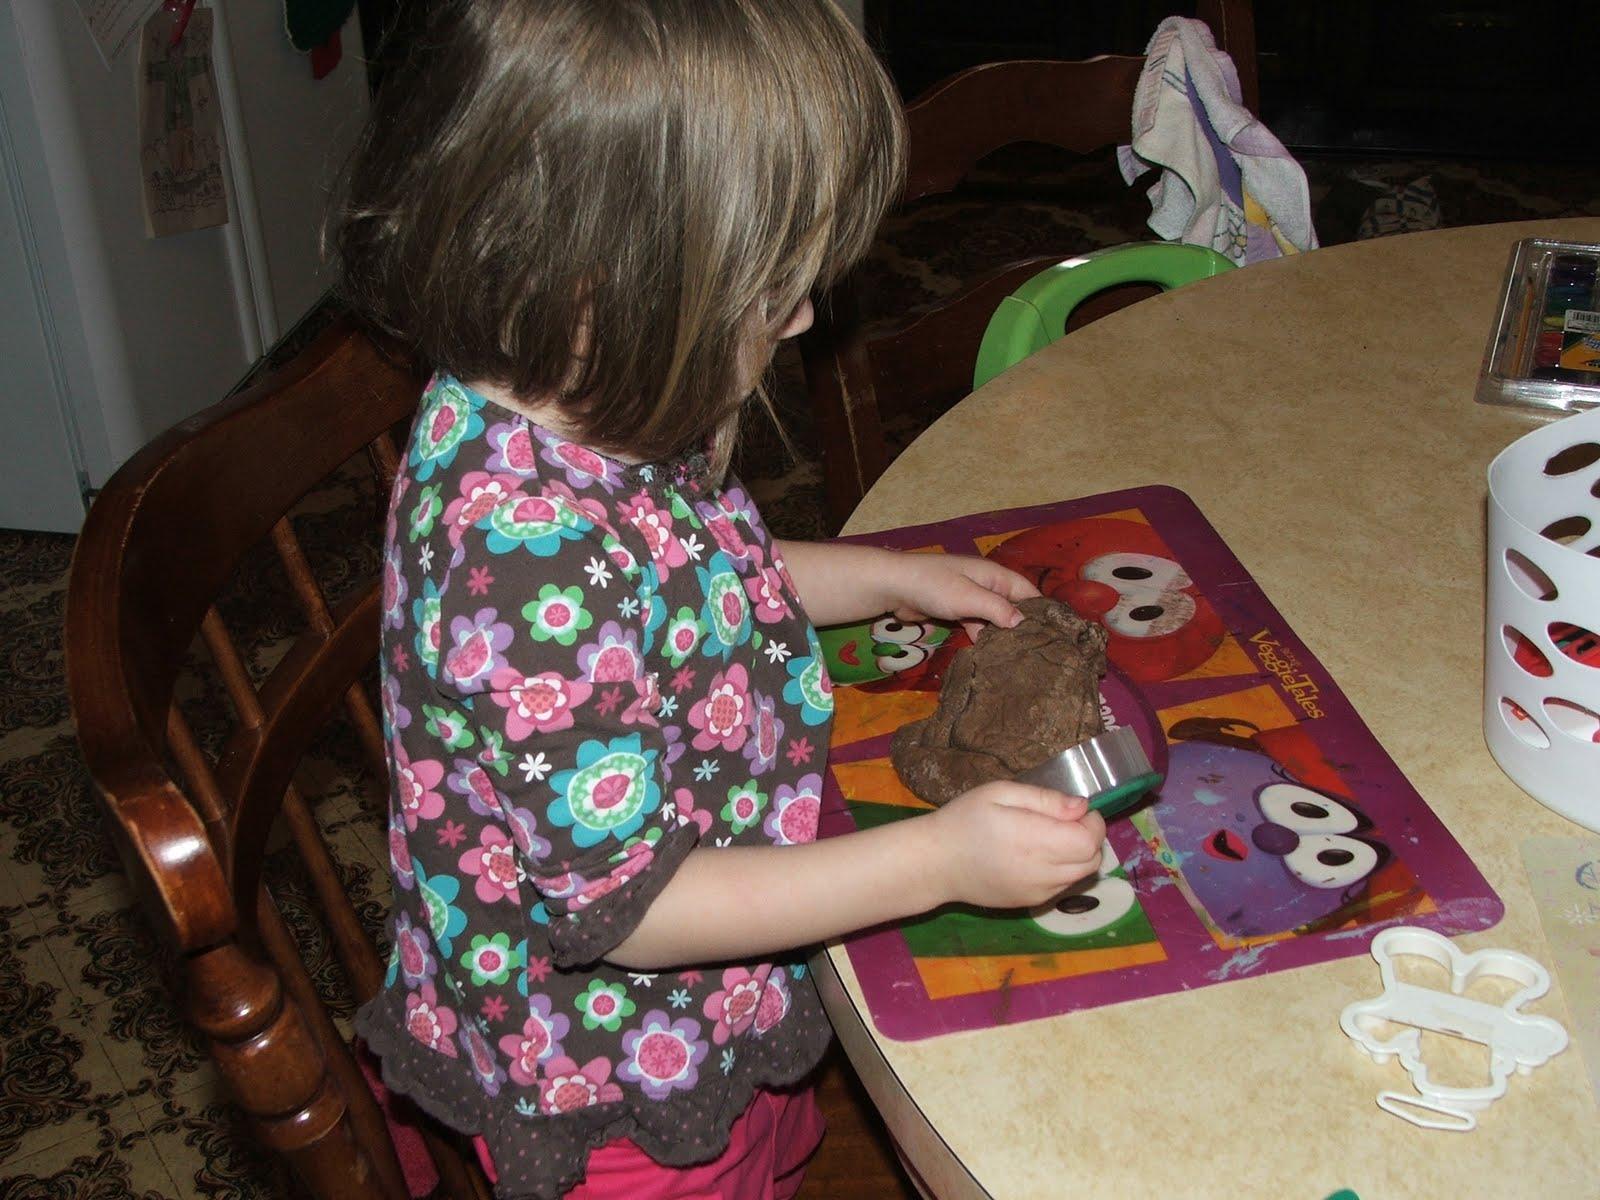 Parenting Beyond Preschool